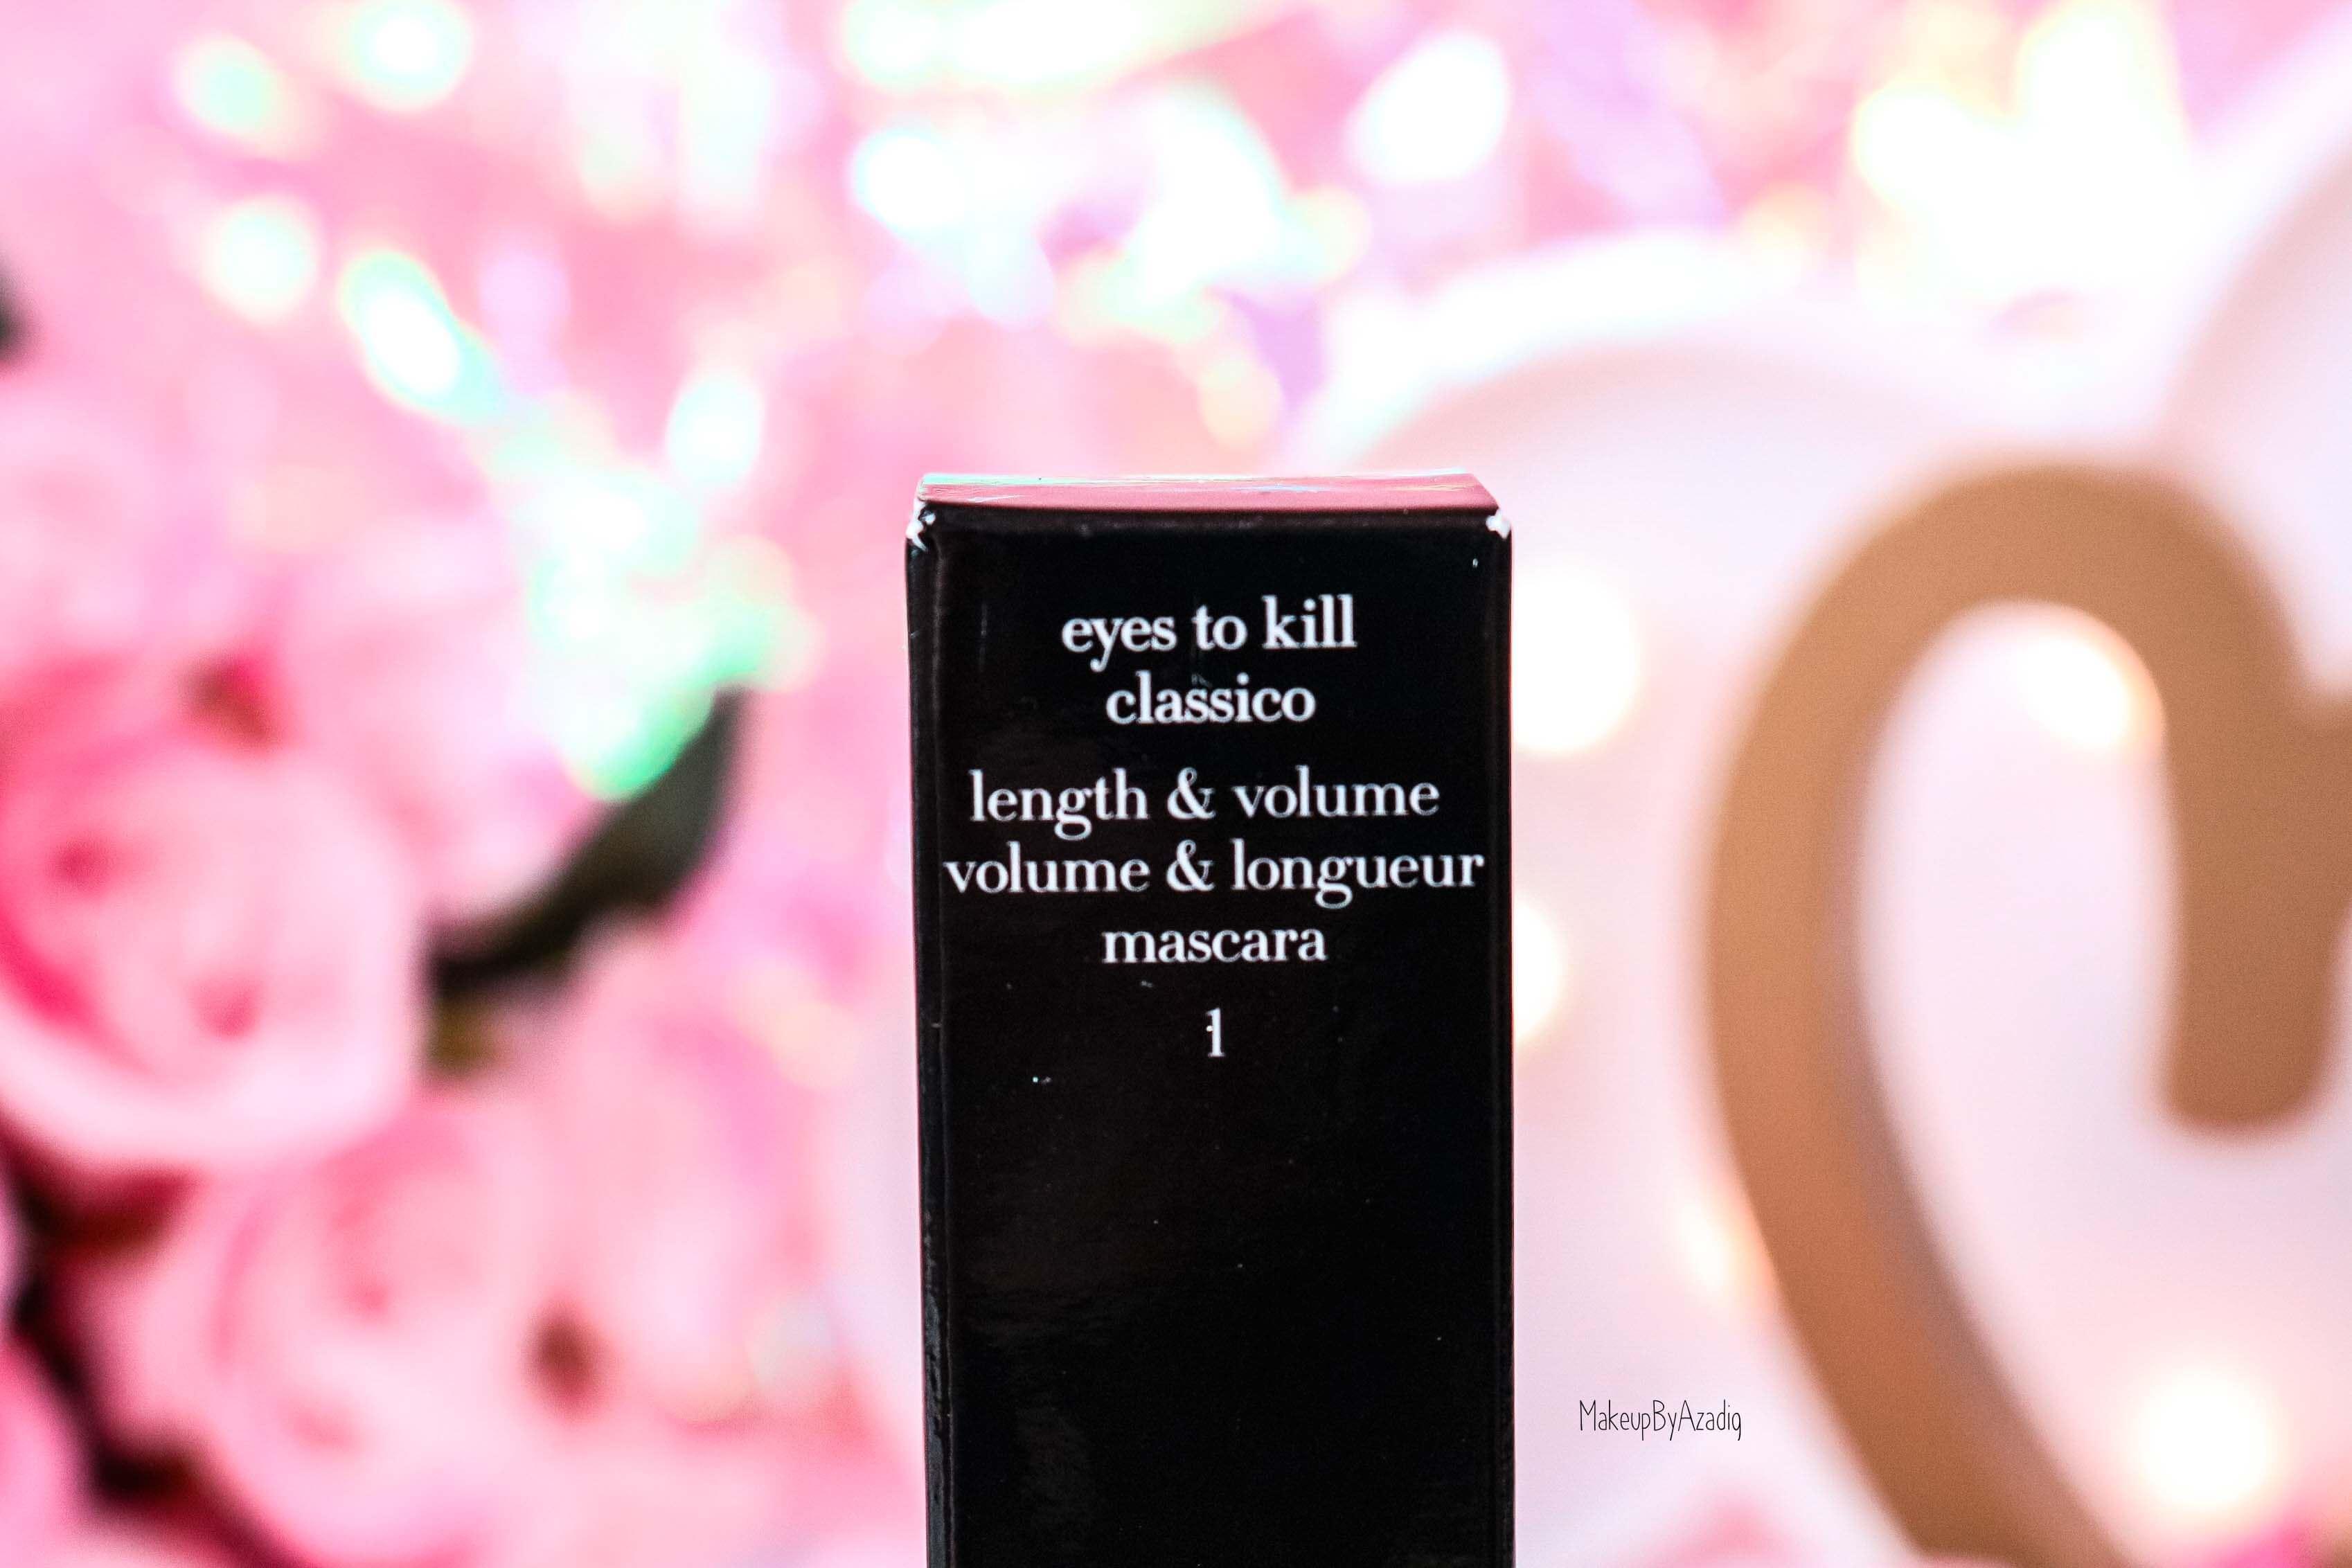 revue-meilleur-mascara-noir-giorgio-armani-eyes-to-kill-classico-volume-longueur-avis-prix-sephora-makeupbyazadig-zoom